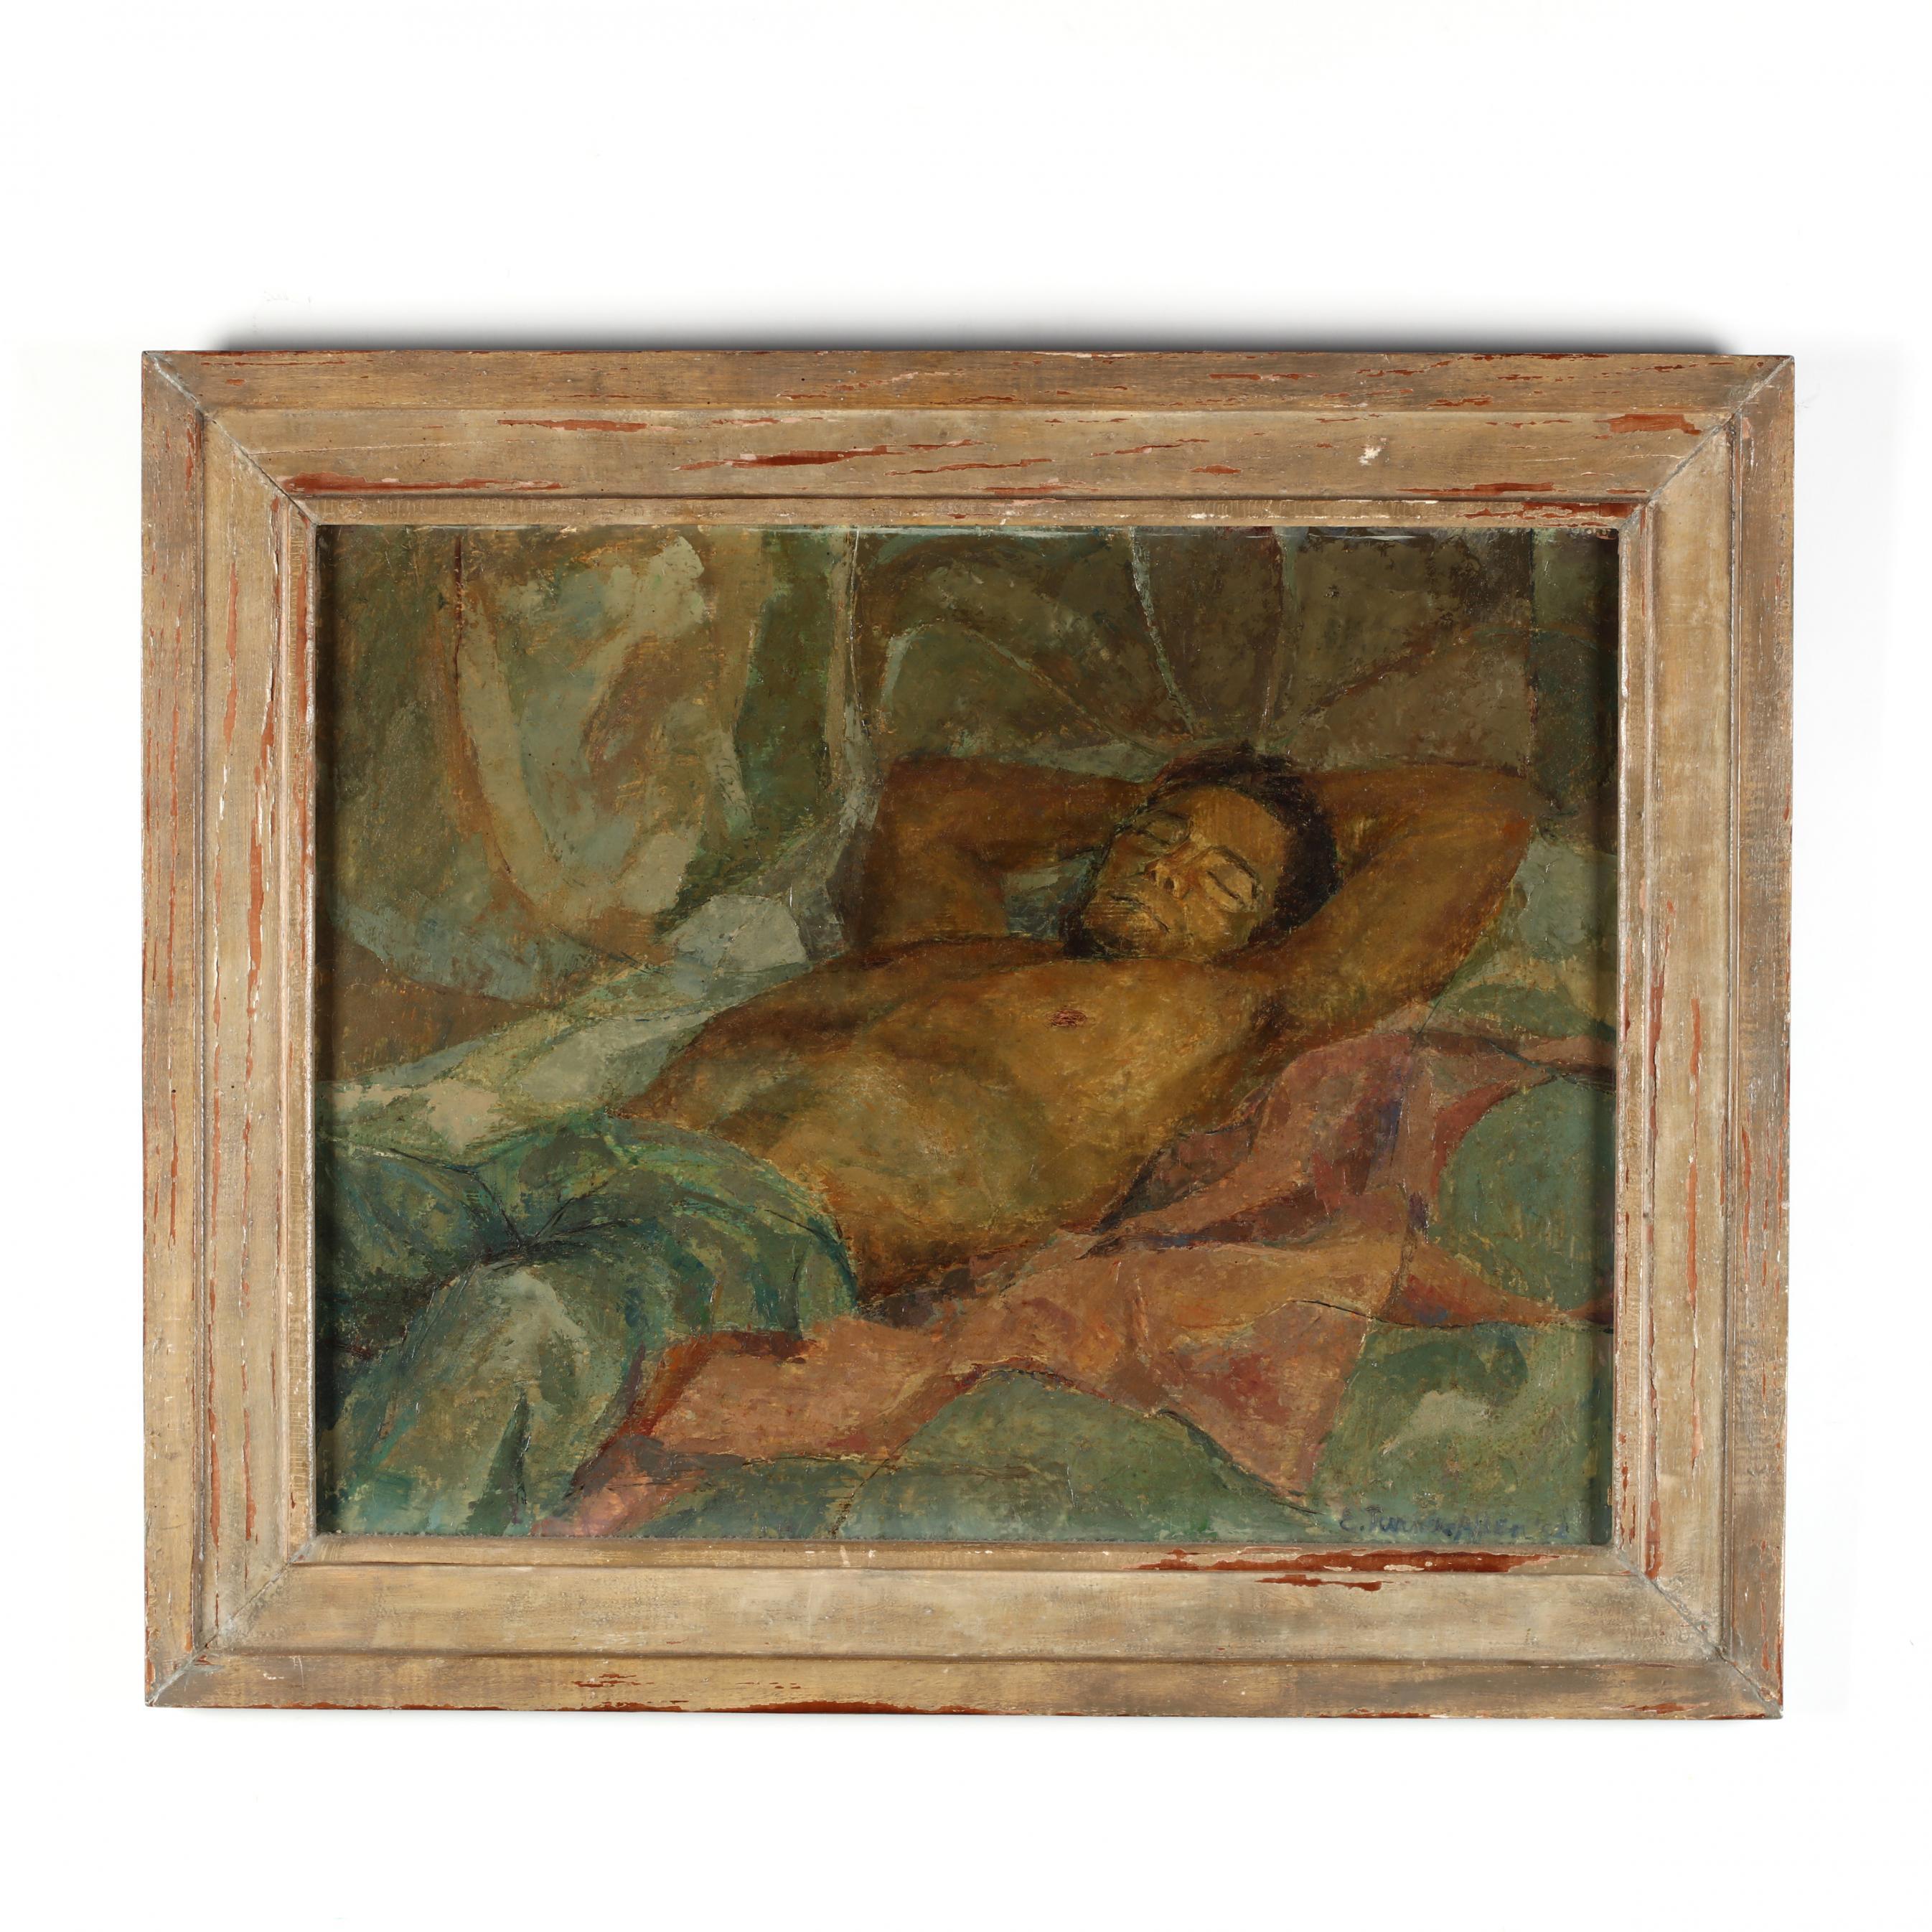 e-turner-allen-american-20th-century-man-sleeping